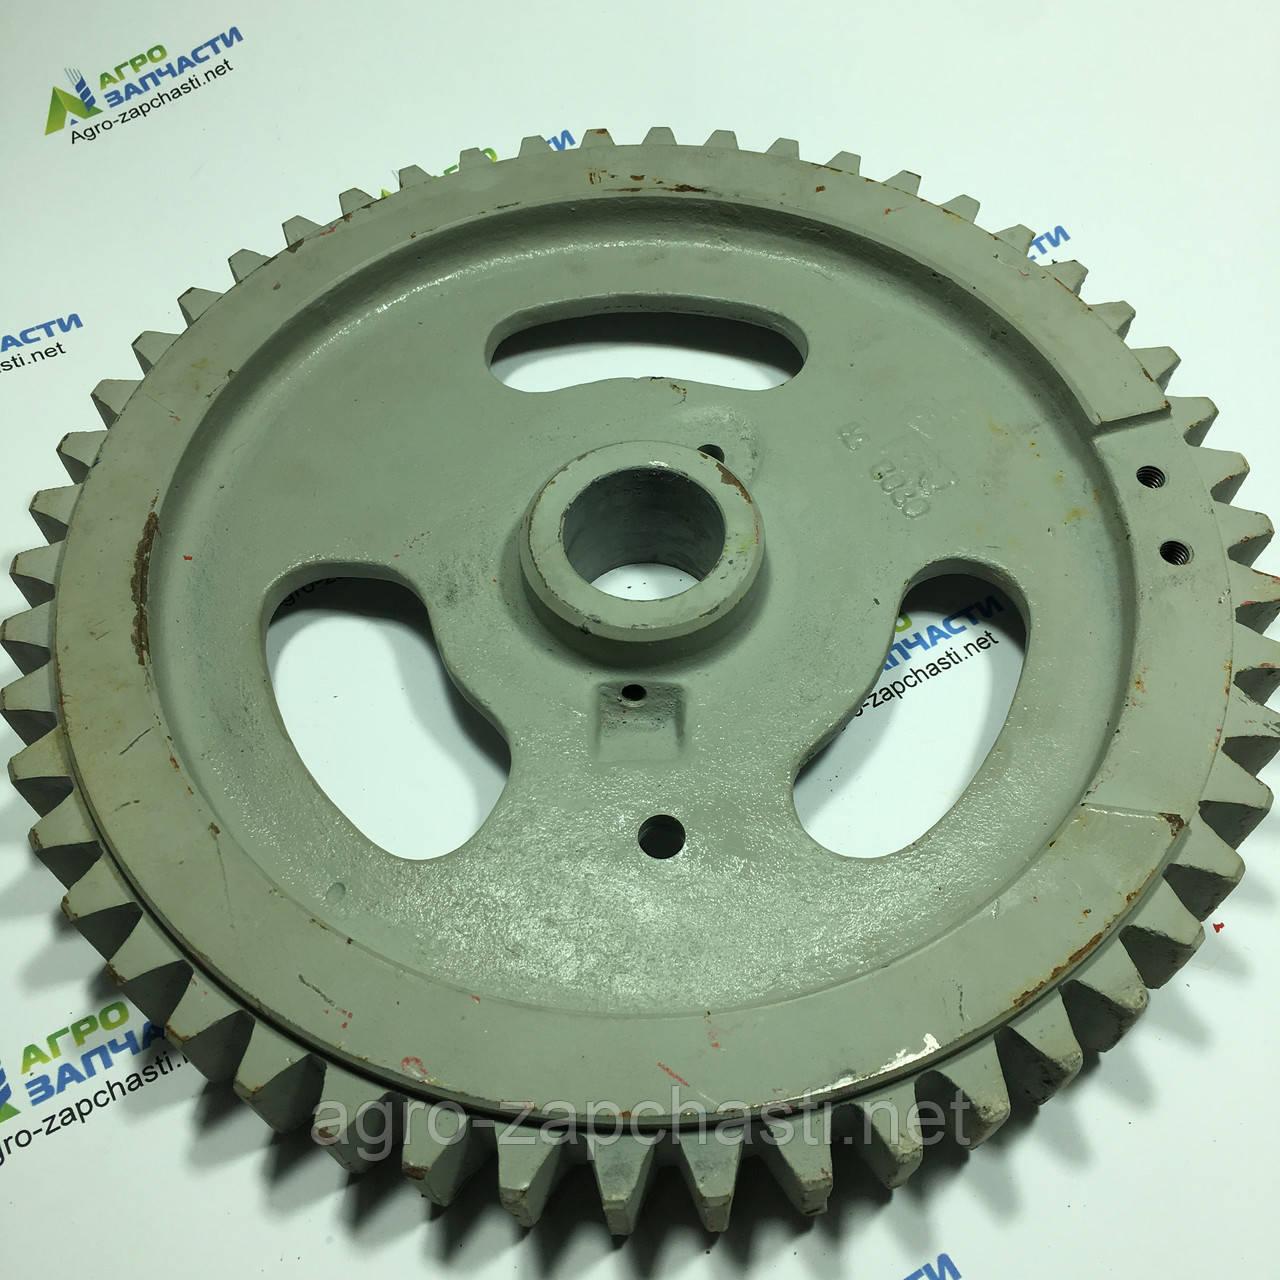 Шестерня привода аппарата пресс-подборщика Welger (50 зубьев), d37мм